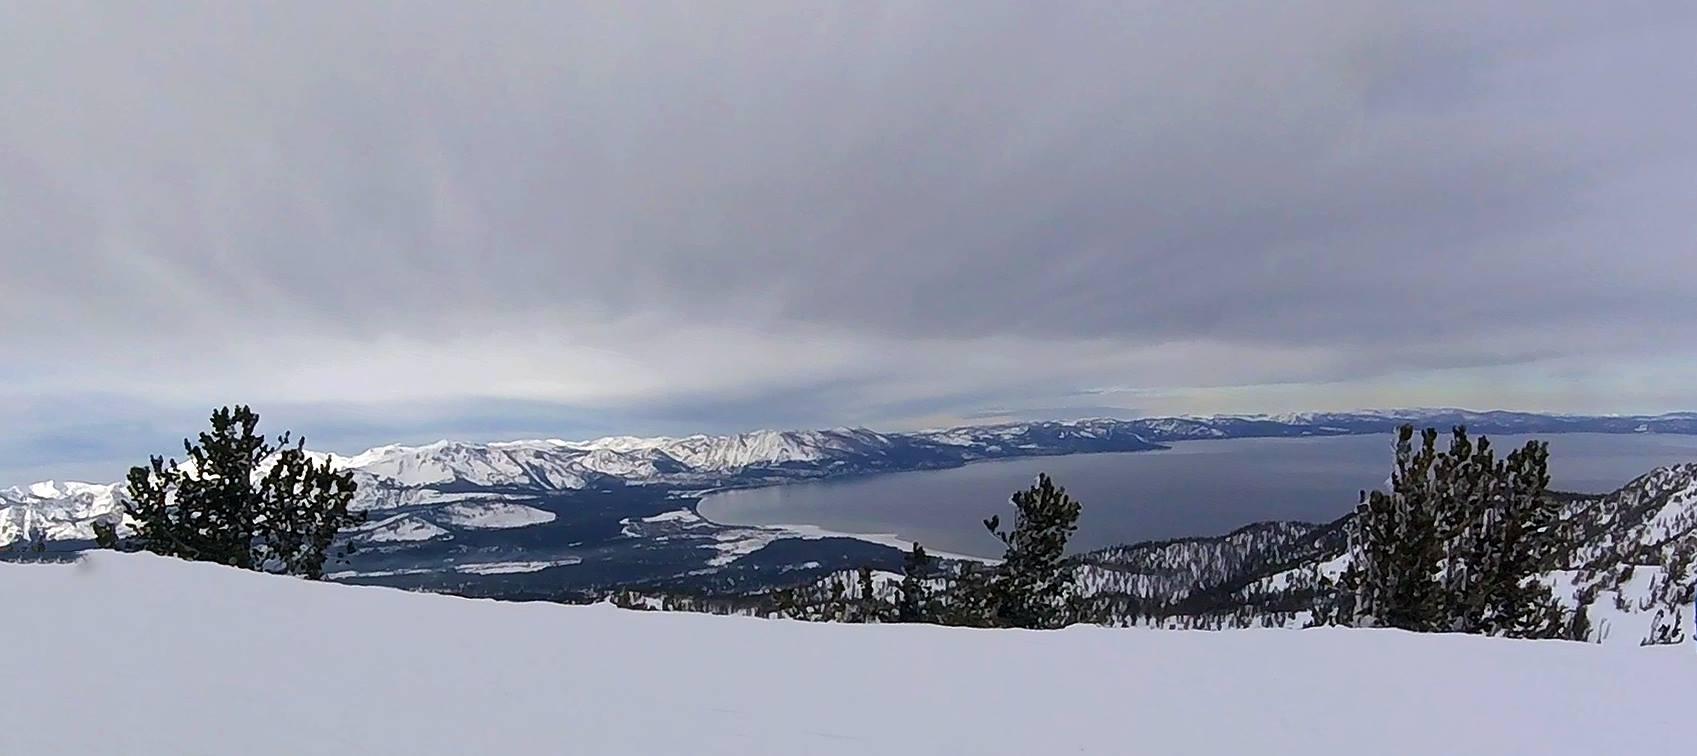 Sergey's Interests -Snowboarding (Tahoe)